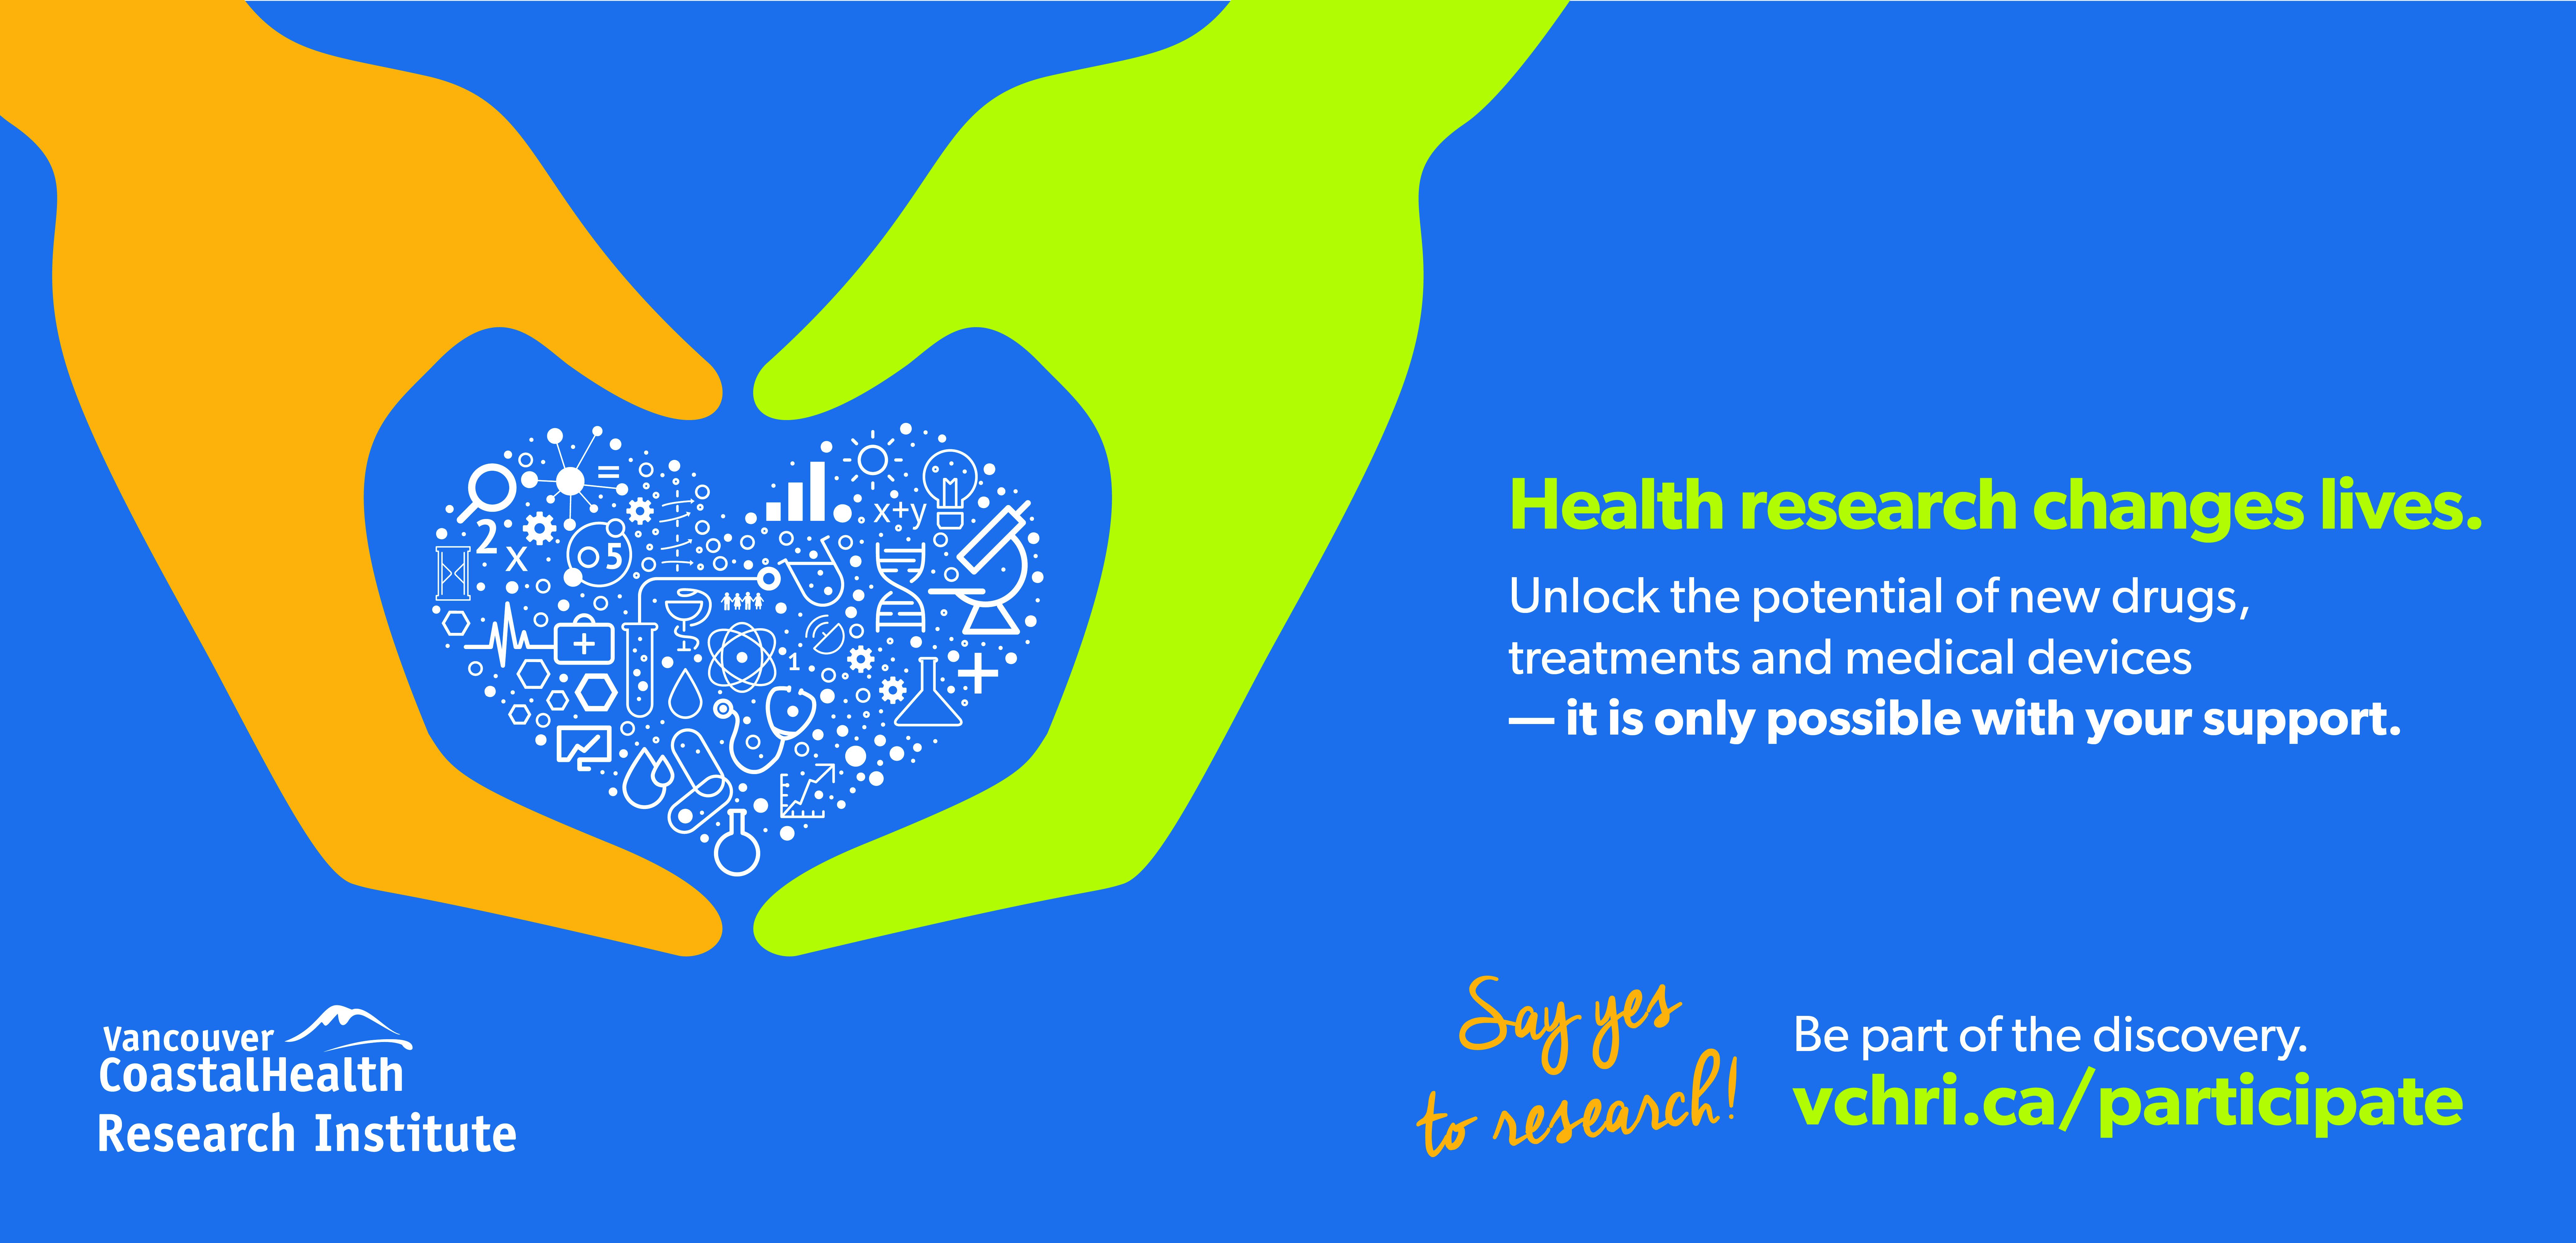 vchri-healthresearch